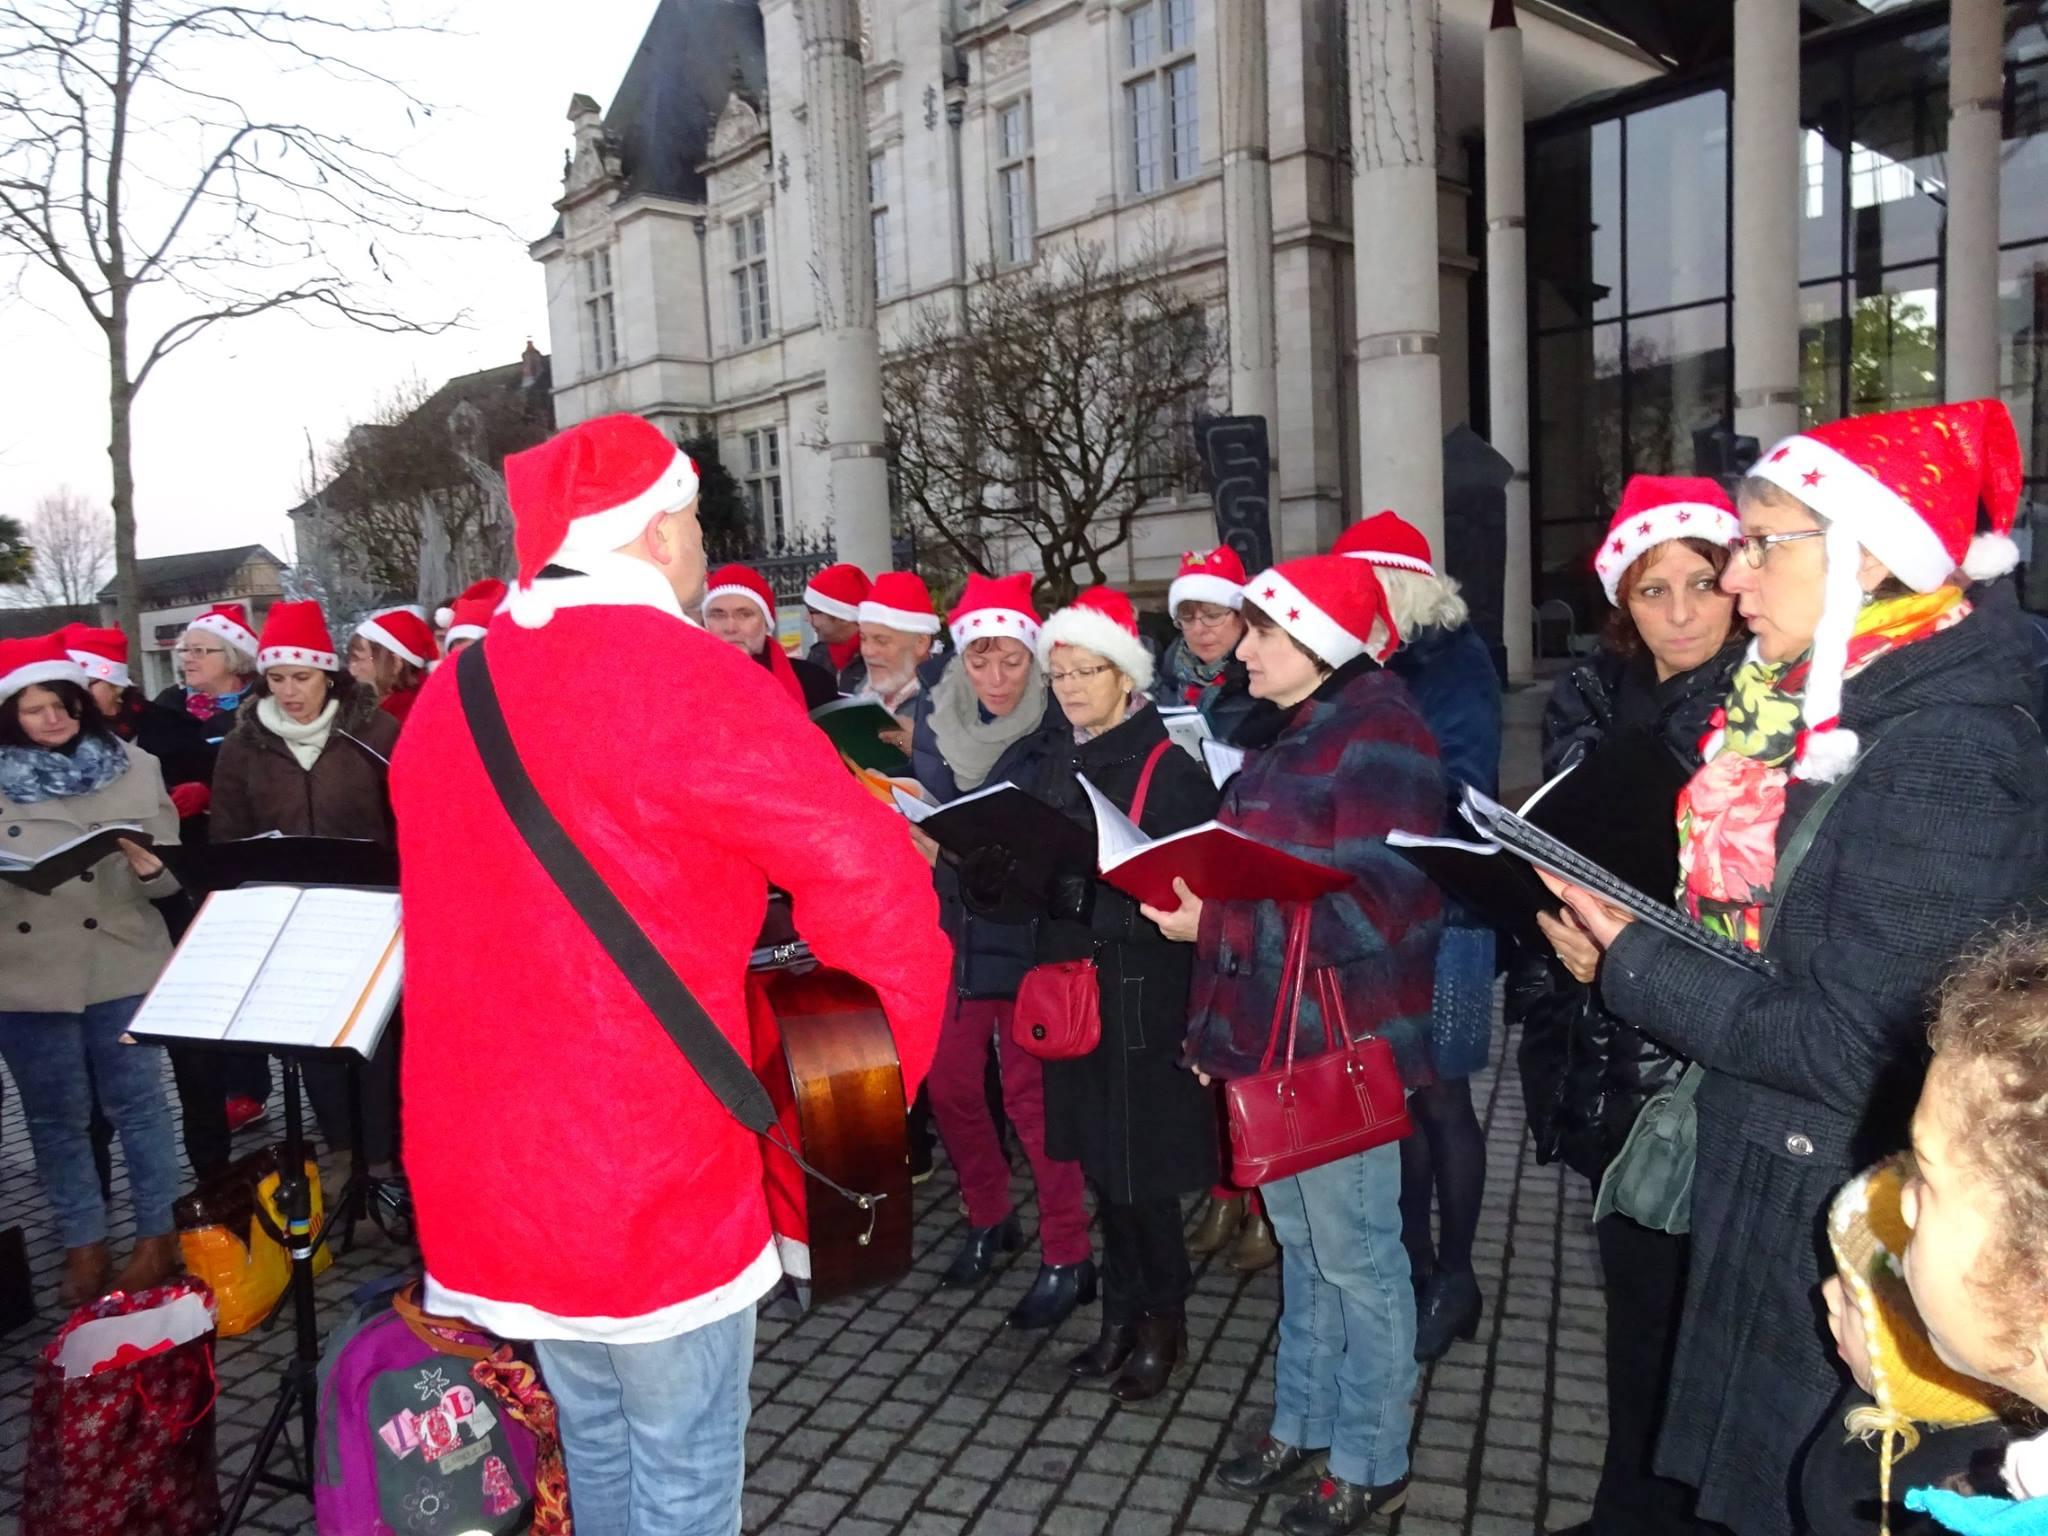 2015-12-12 – Au marché de Noël (8) Sabrina